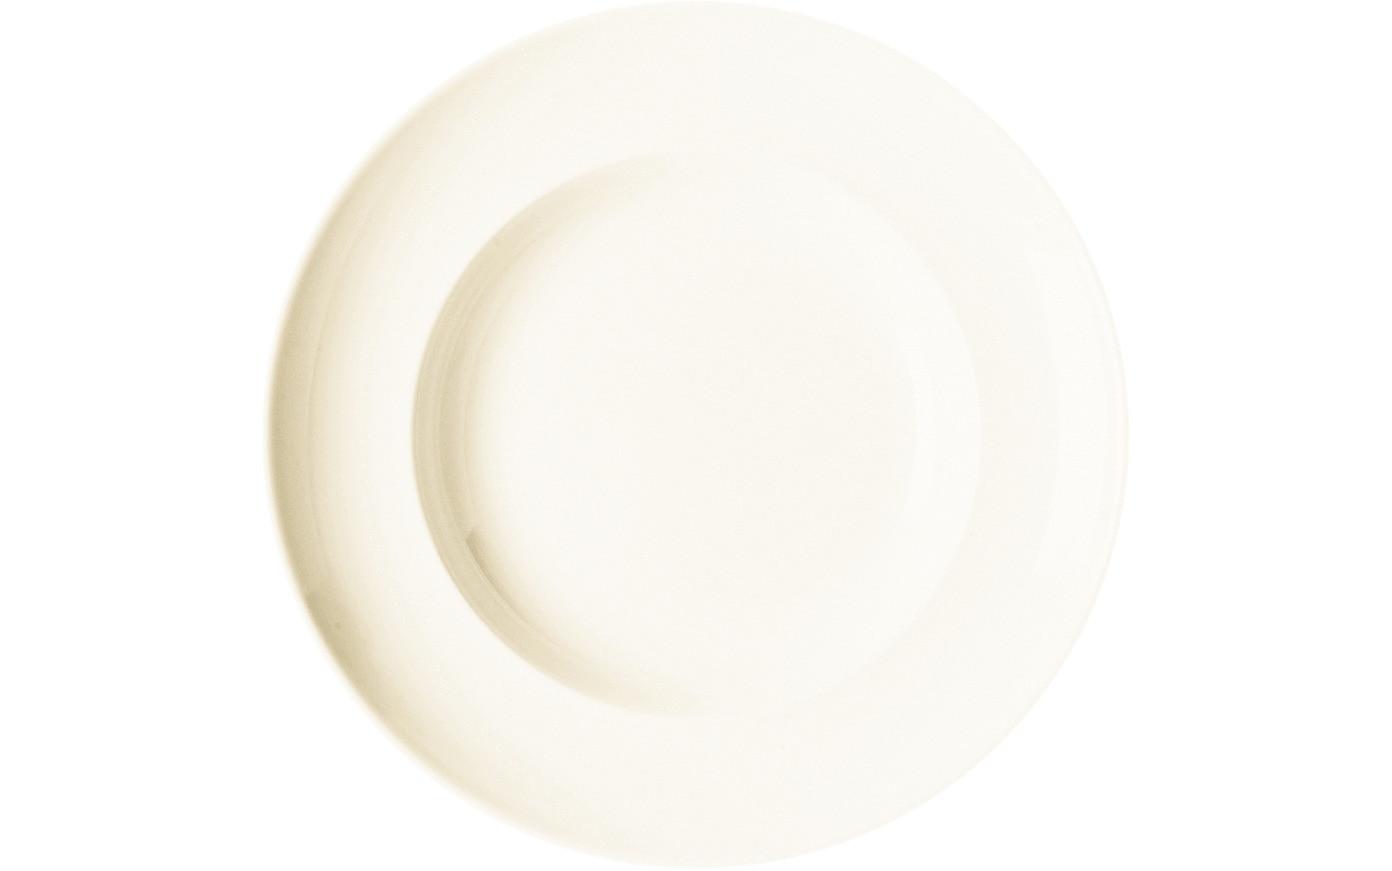 Classic Gourmet, Teller tief ø 240 mm / 0,73 l creme